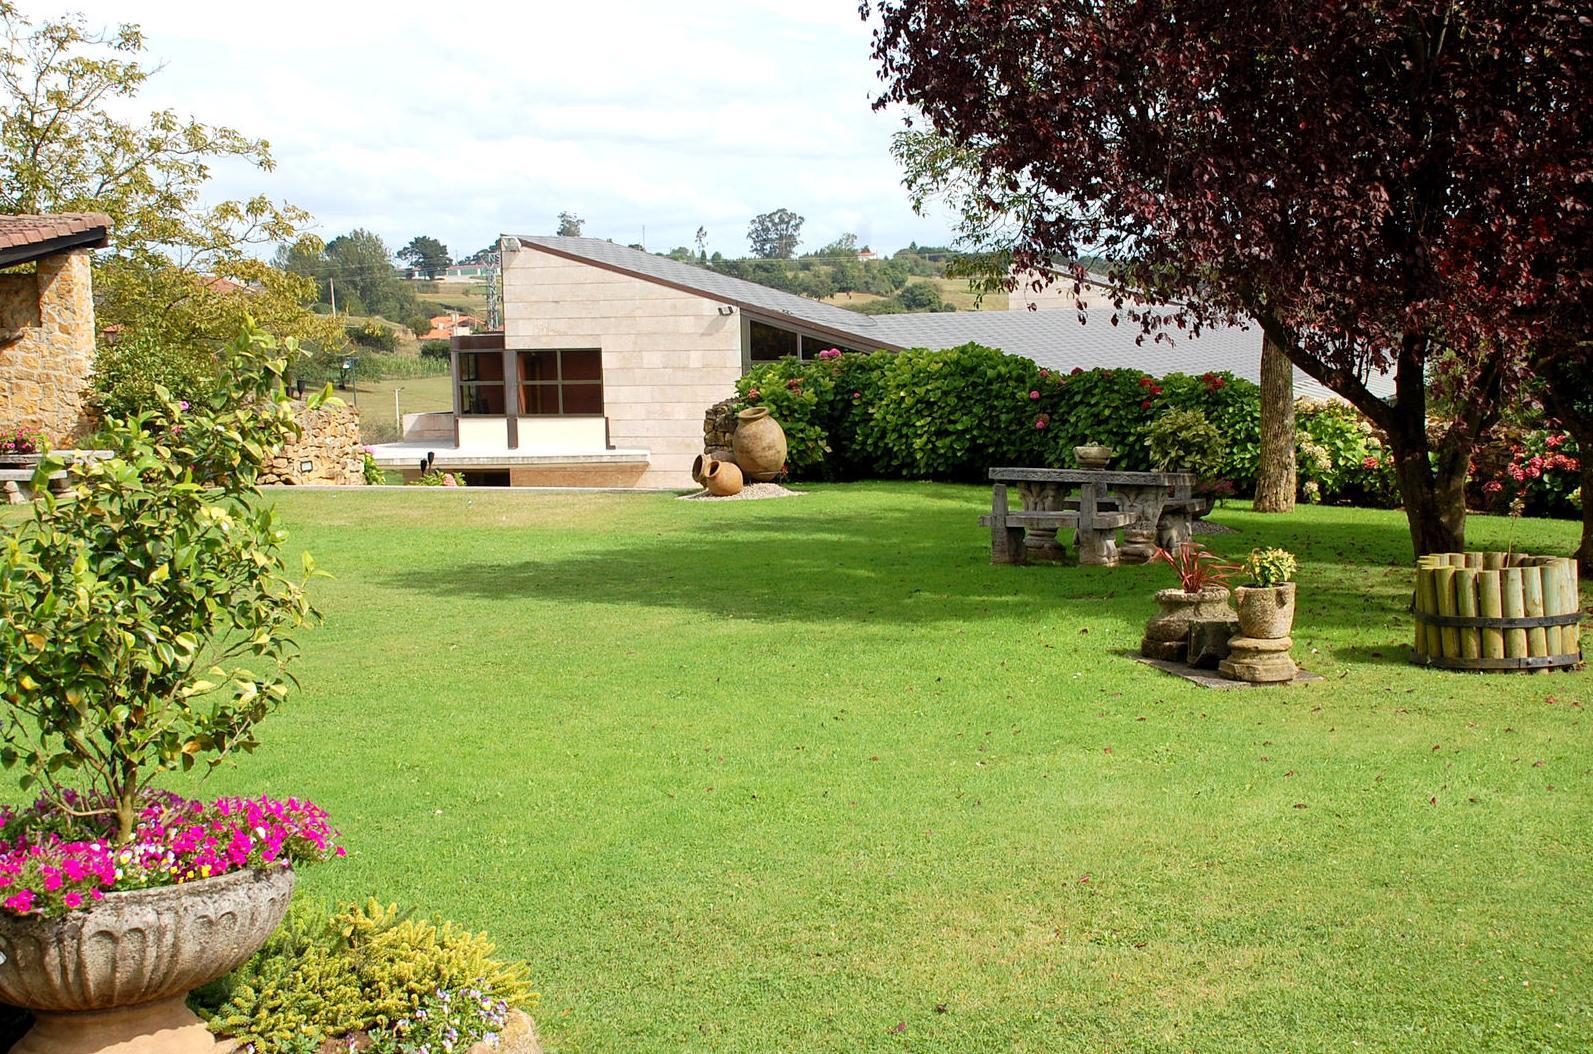 Restaurante para bodas en Asturias. A sólo 20 minutos de Oviedo, Gijón y Avilés.